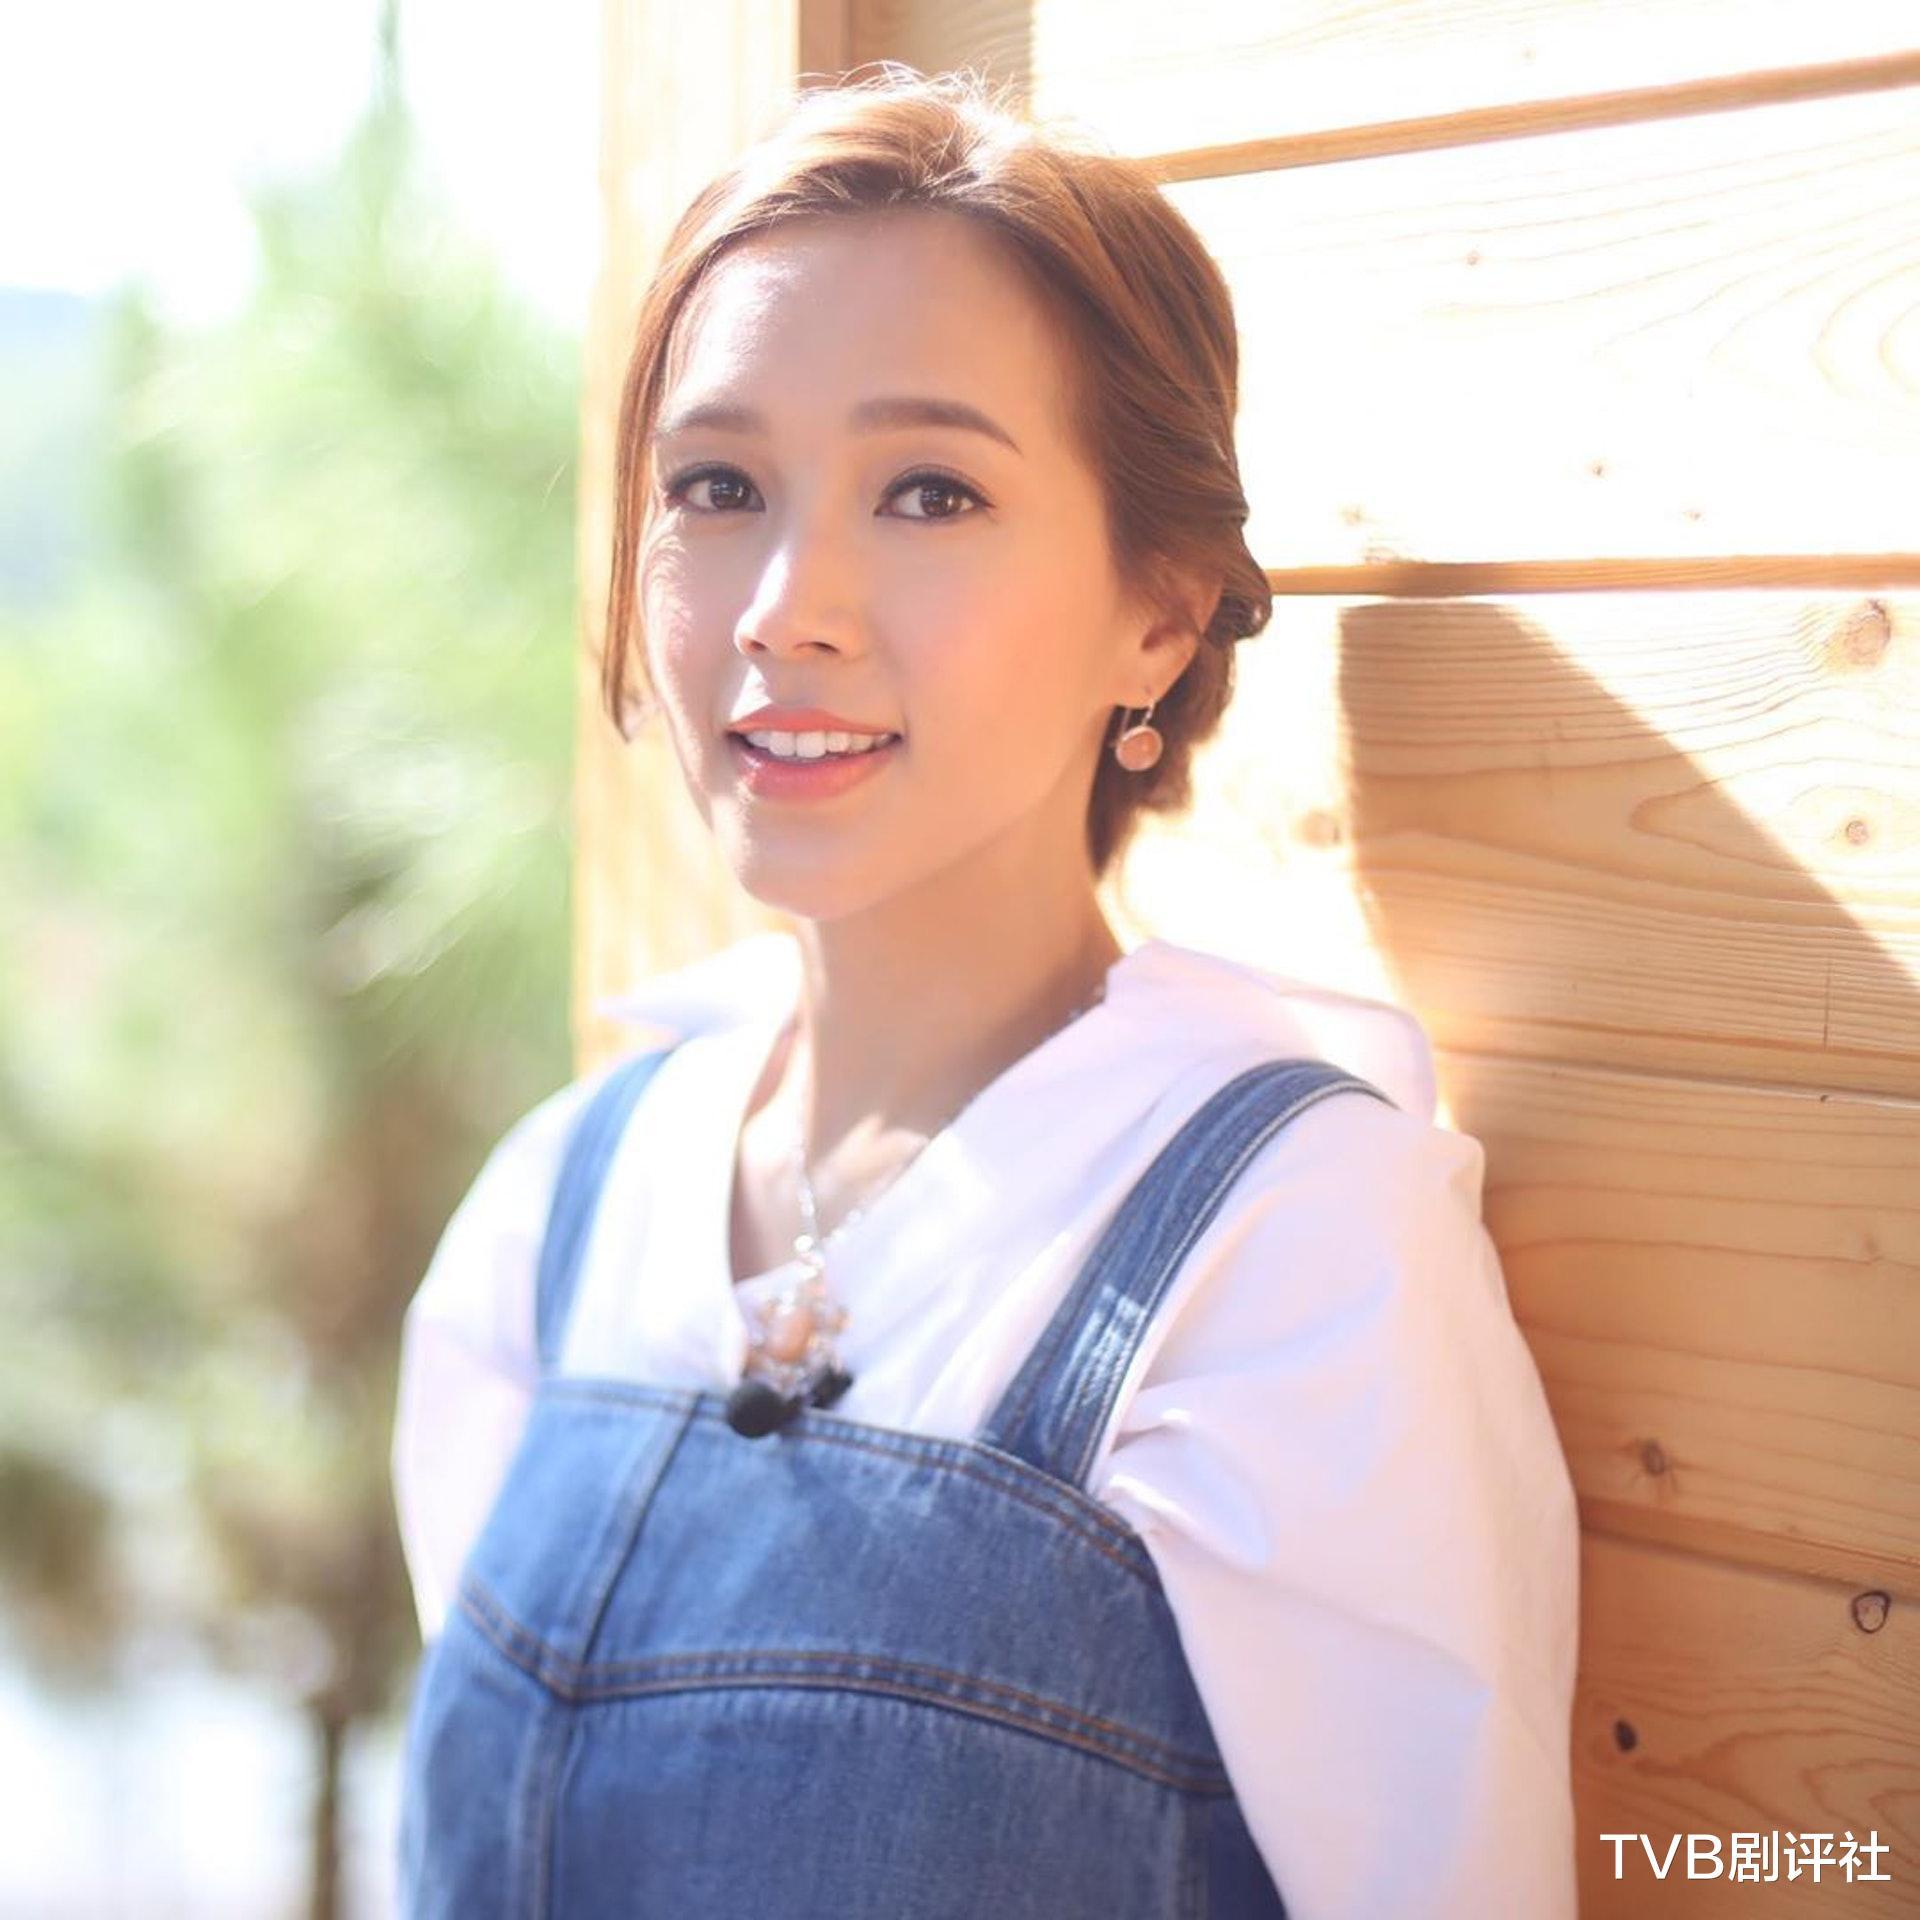 TVB力捧四小花做新劇女主角, 陳曉華僅入行兩年就擔正女一-圖12